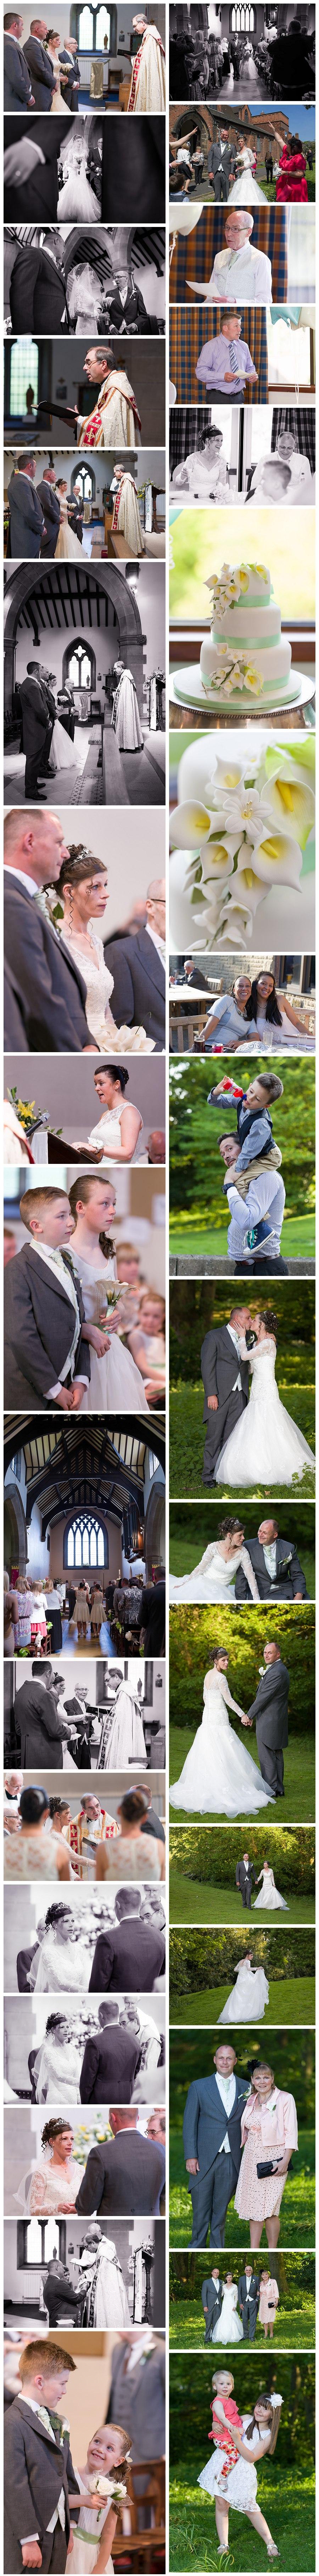 Wedding Photography Brittannia Hotel Leeds Bradford at Bramhope, wedding photos St Wilfrids church Harehills